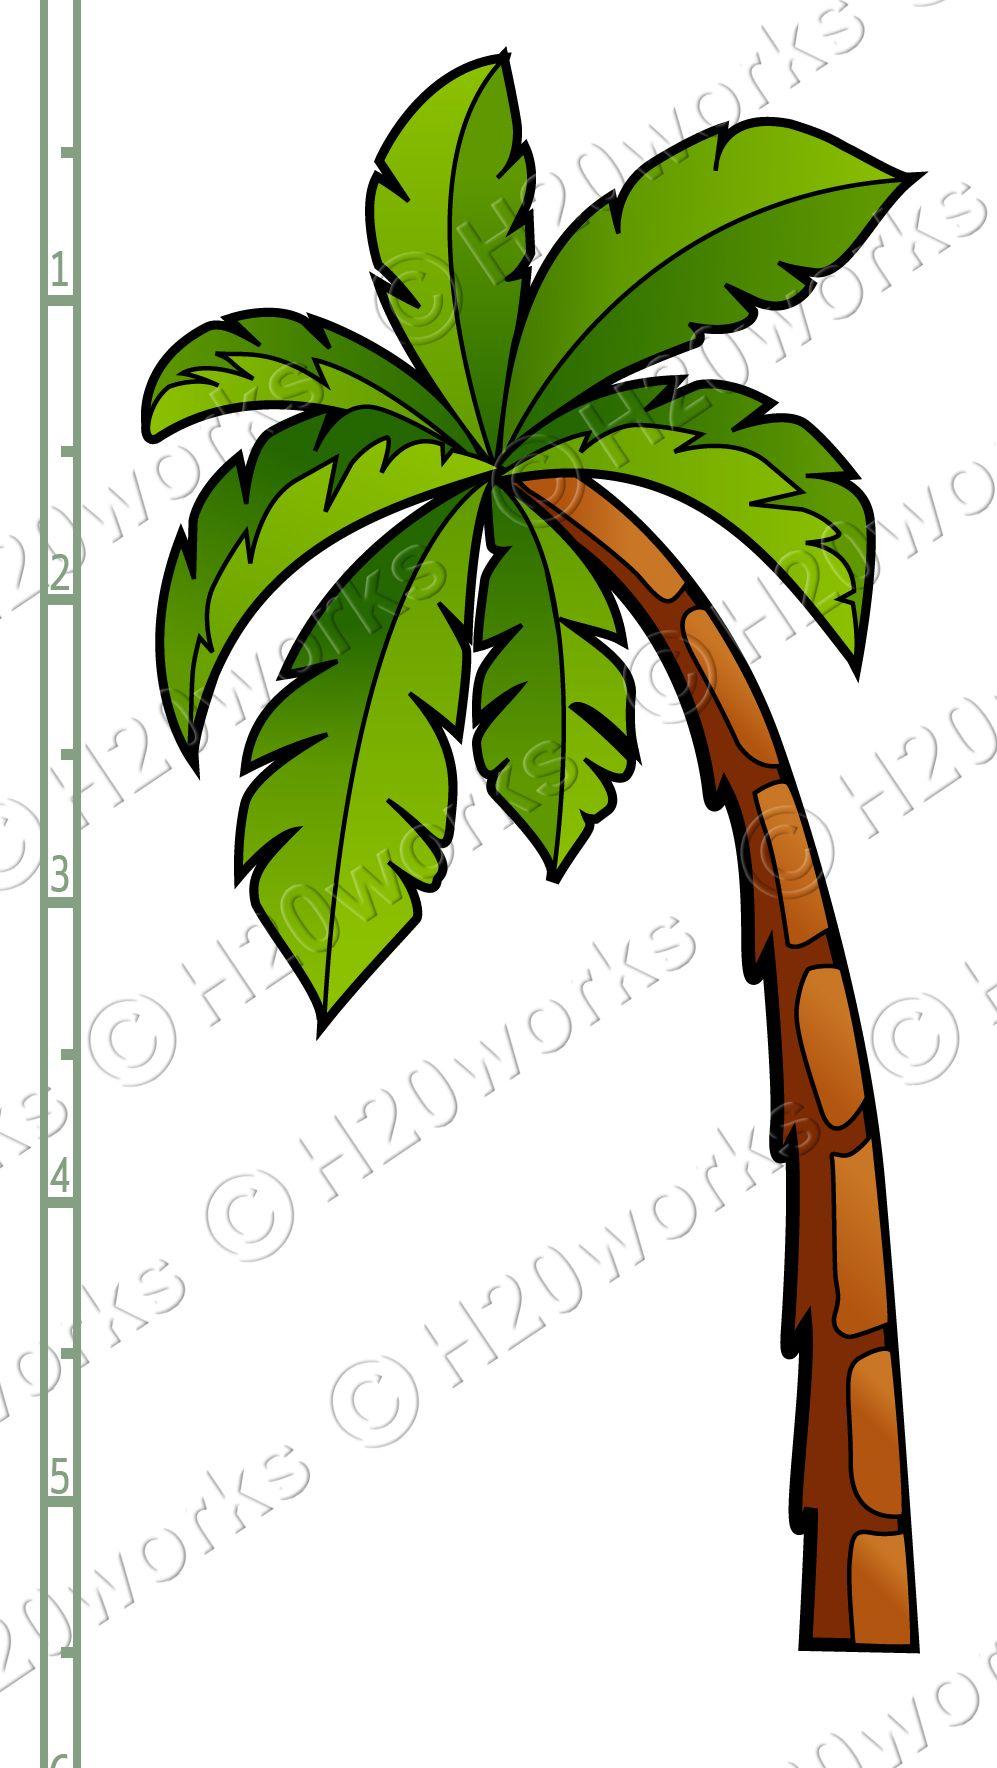 03 Web Original Jpg Clipart Panda Free Clipart Images Palm